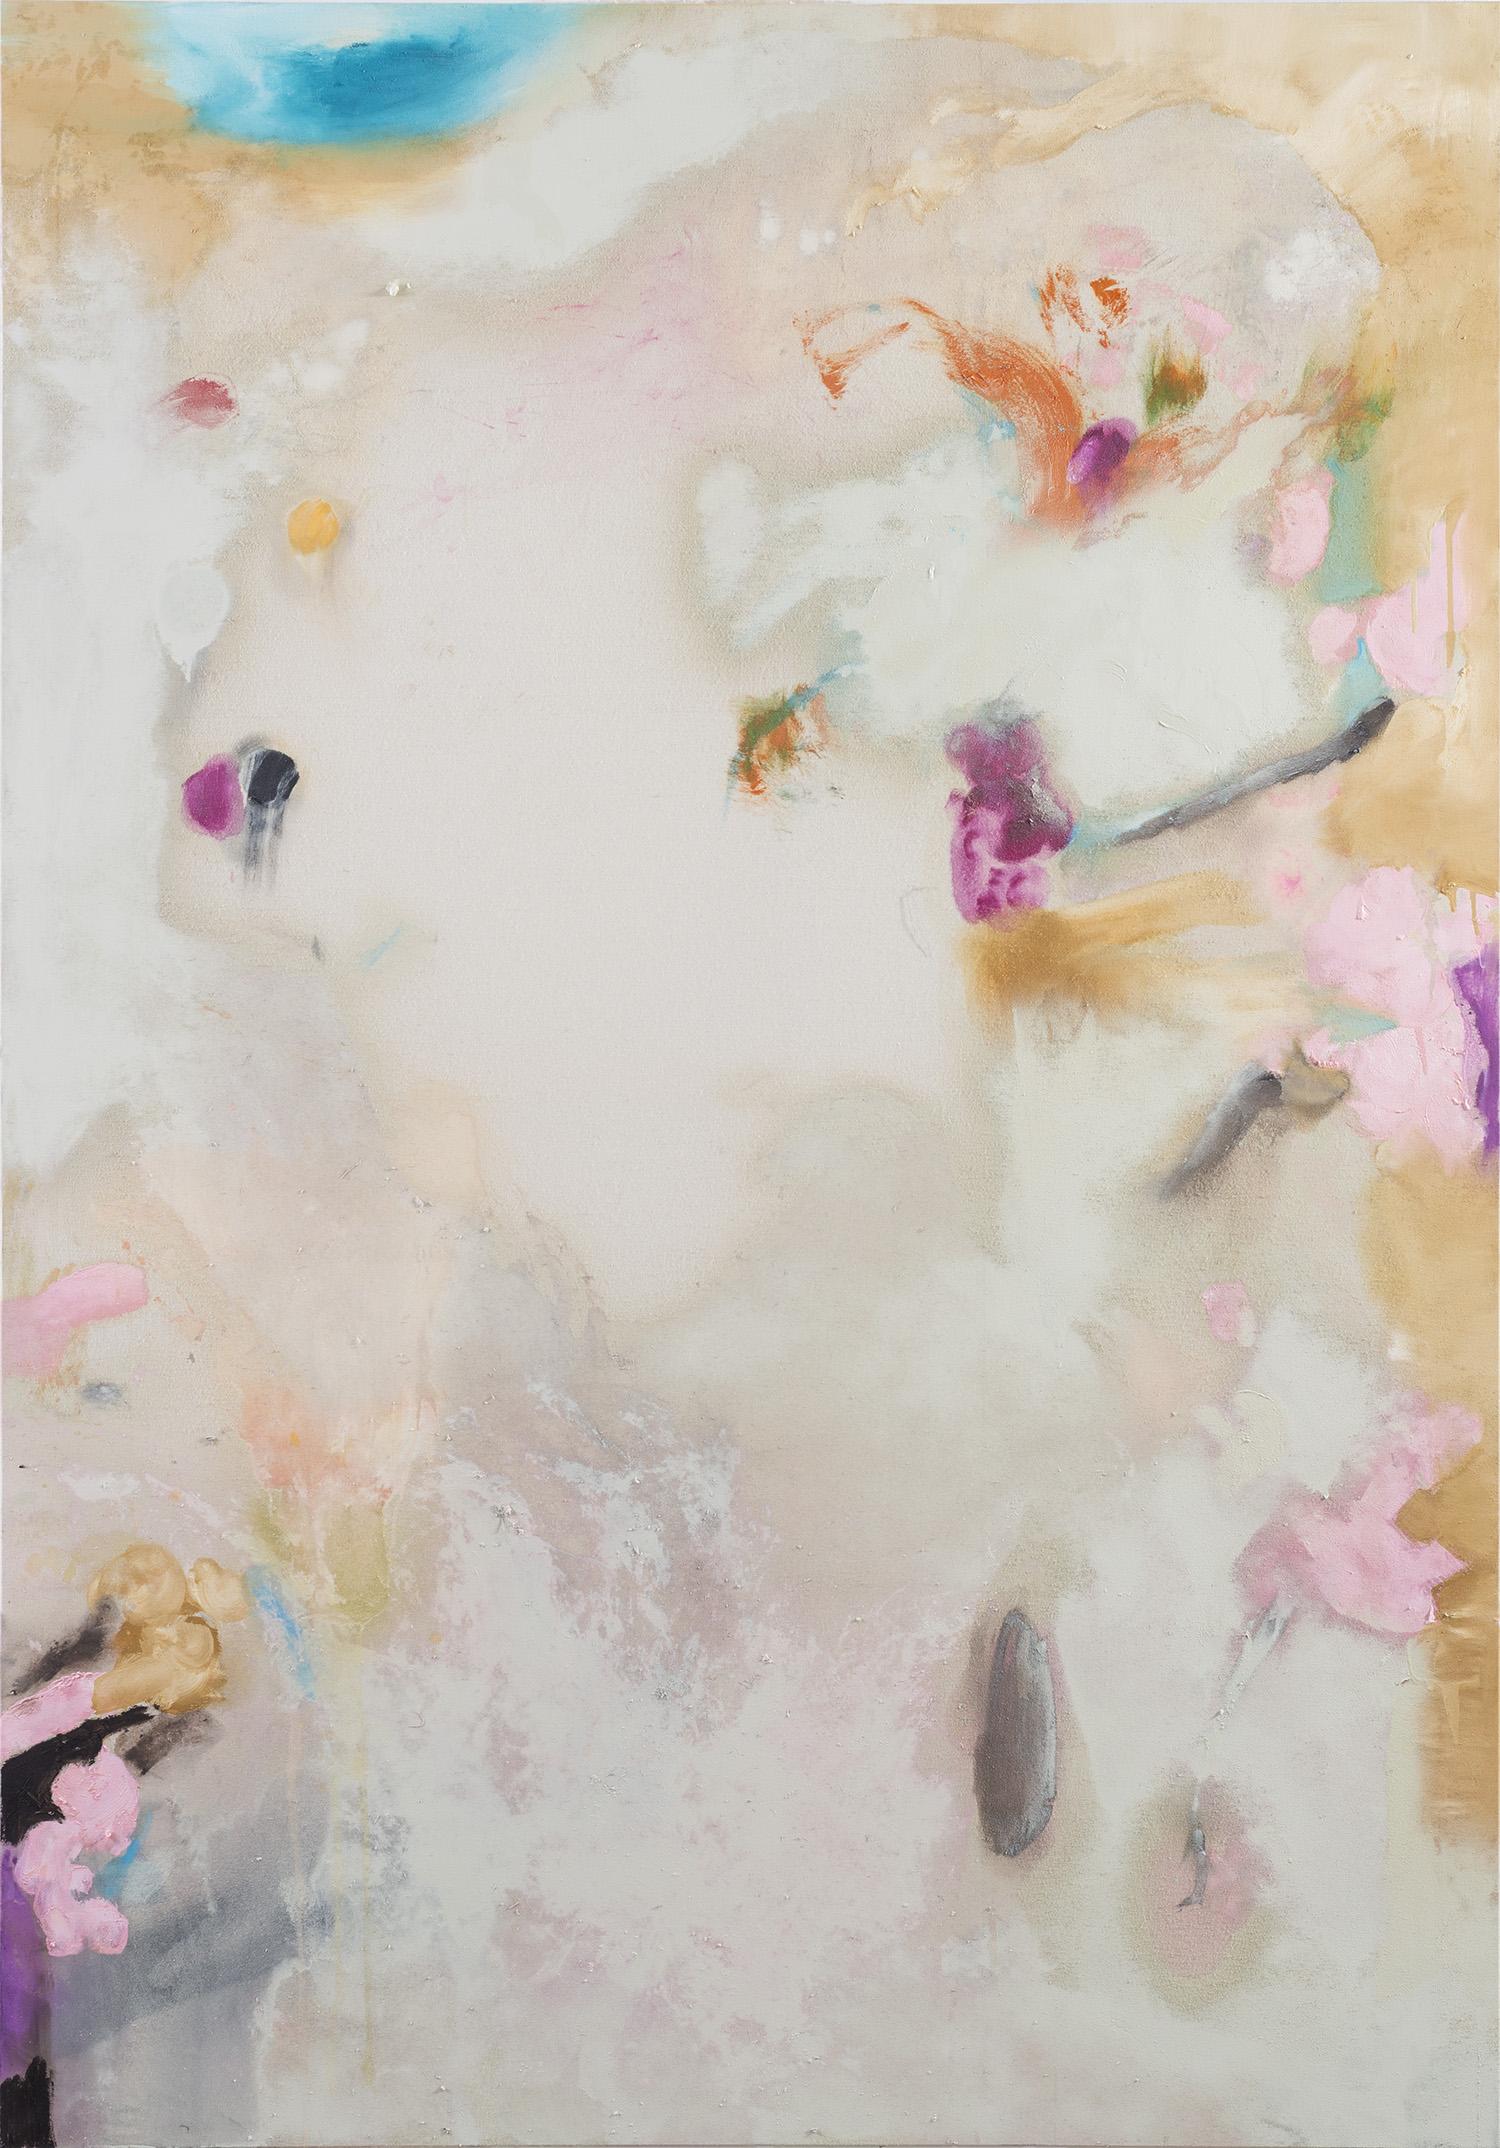 """Bernt"" 2016, acrilico e vernice spray su ecopelle, 200 x 142 cm"